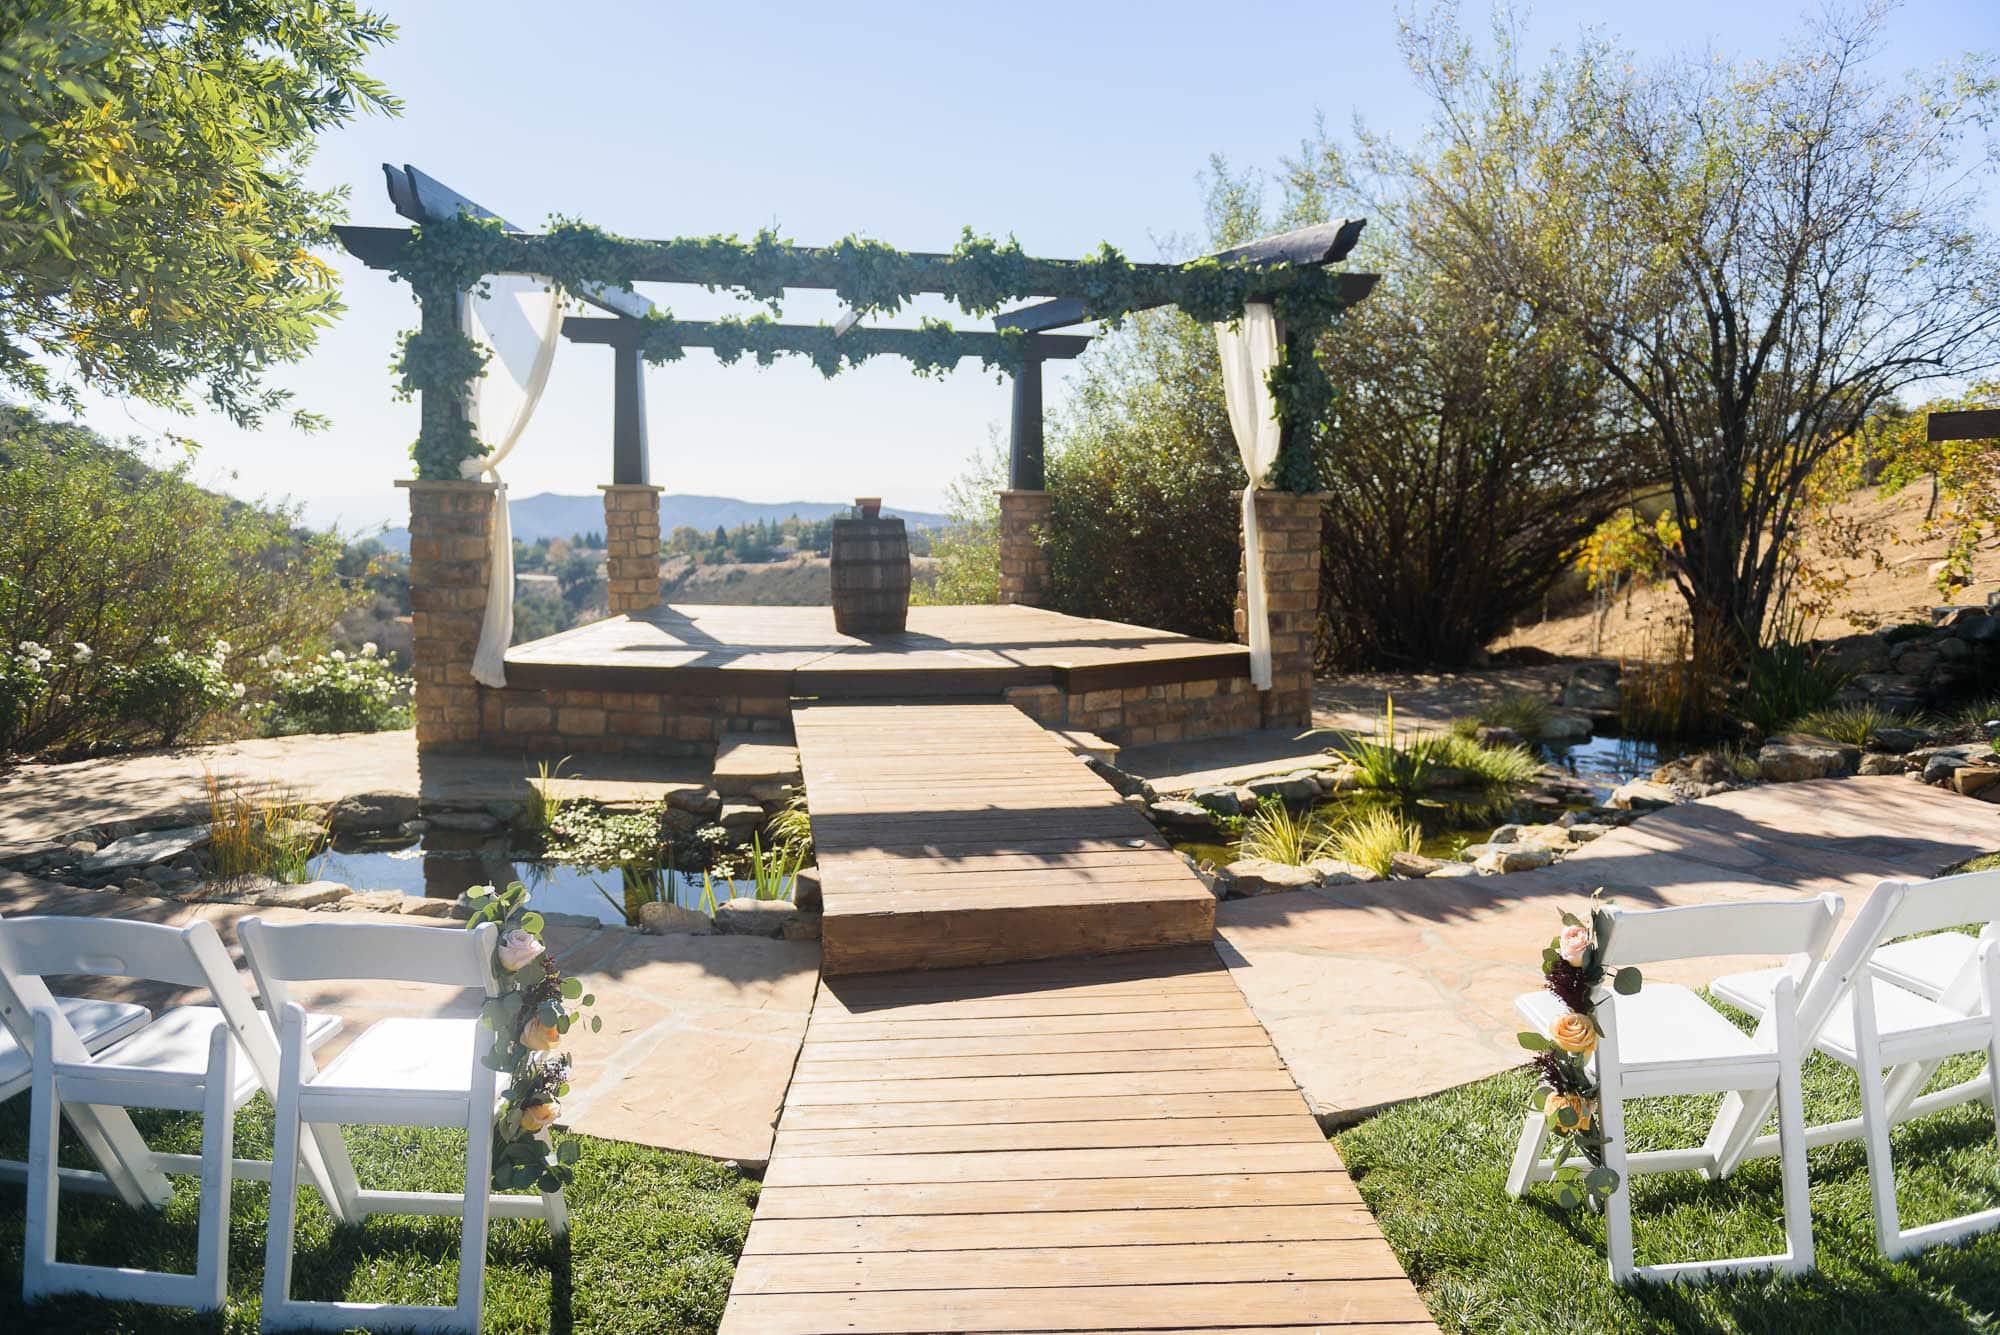 125_Alan_and_Heidi_Serendipity_Garden_Wedding_10-27-2018